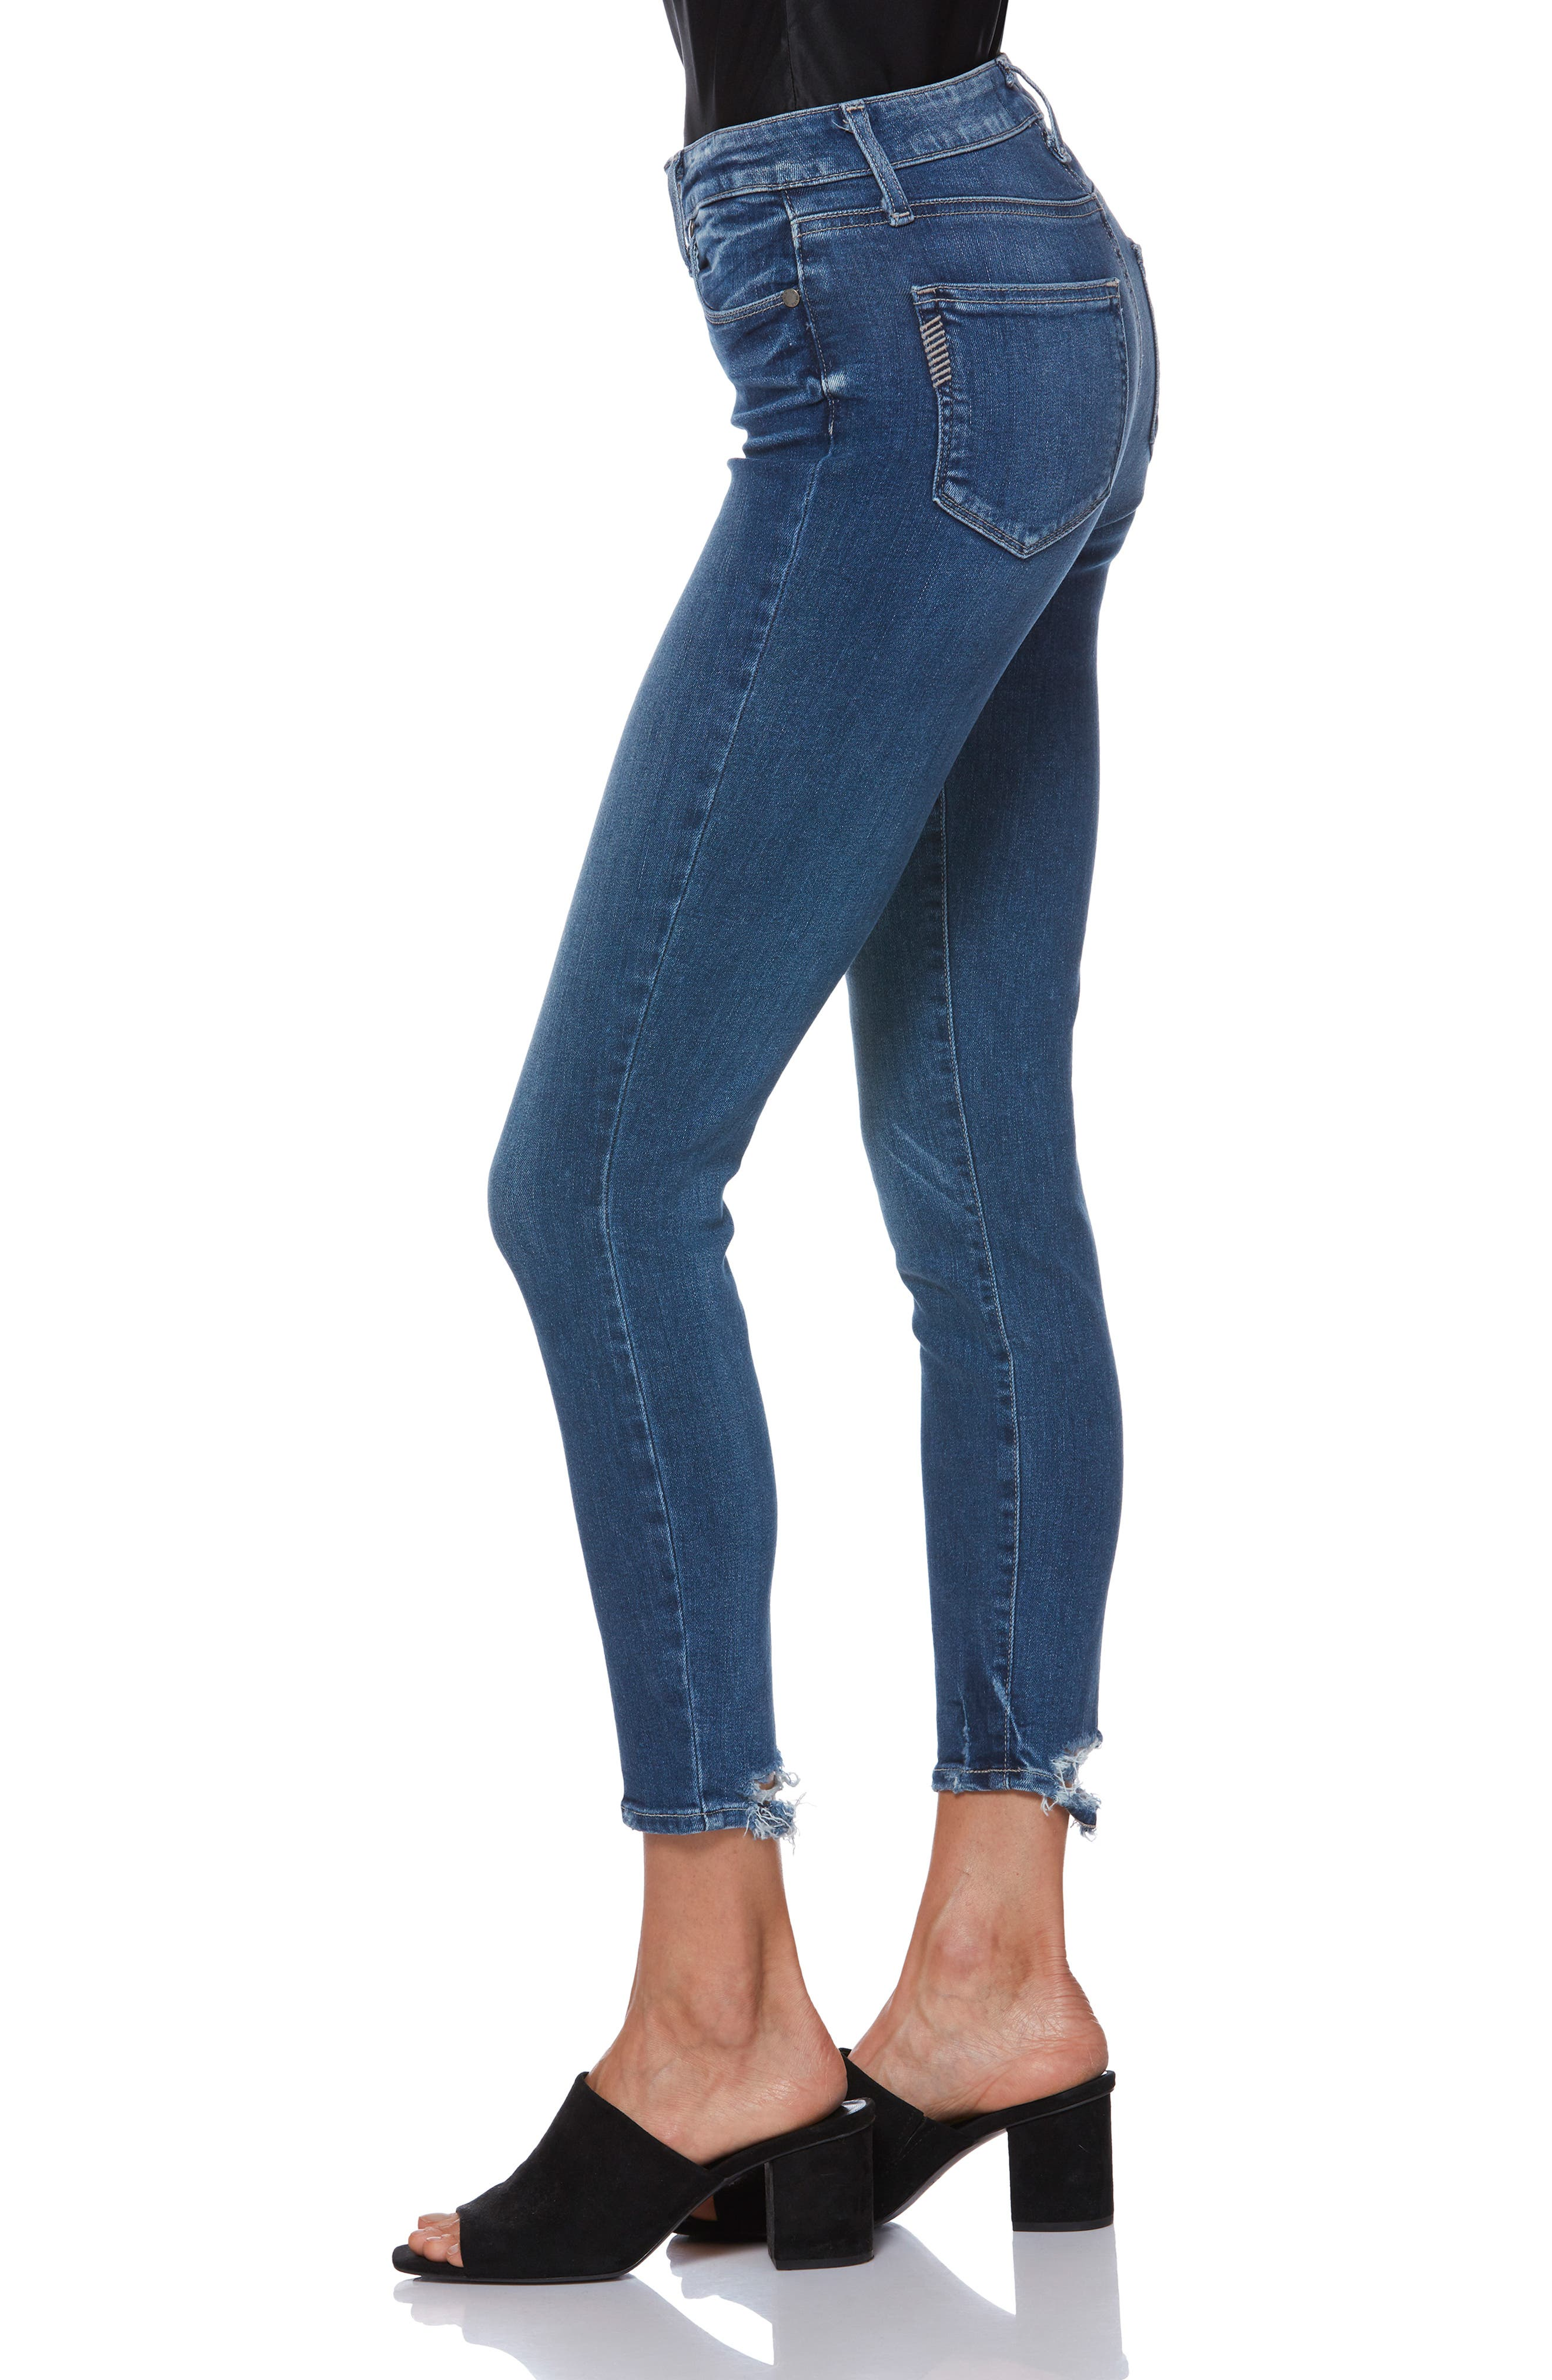 PAIGE, Hoxton Transcend Vintage High Waist Crop Skinny Jeans, Alternate thumbnail 3, color, 400